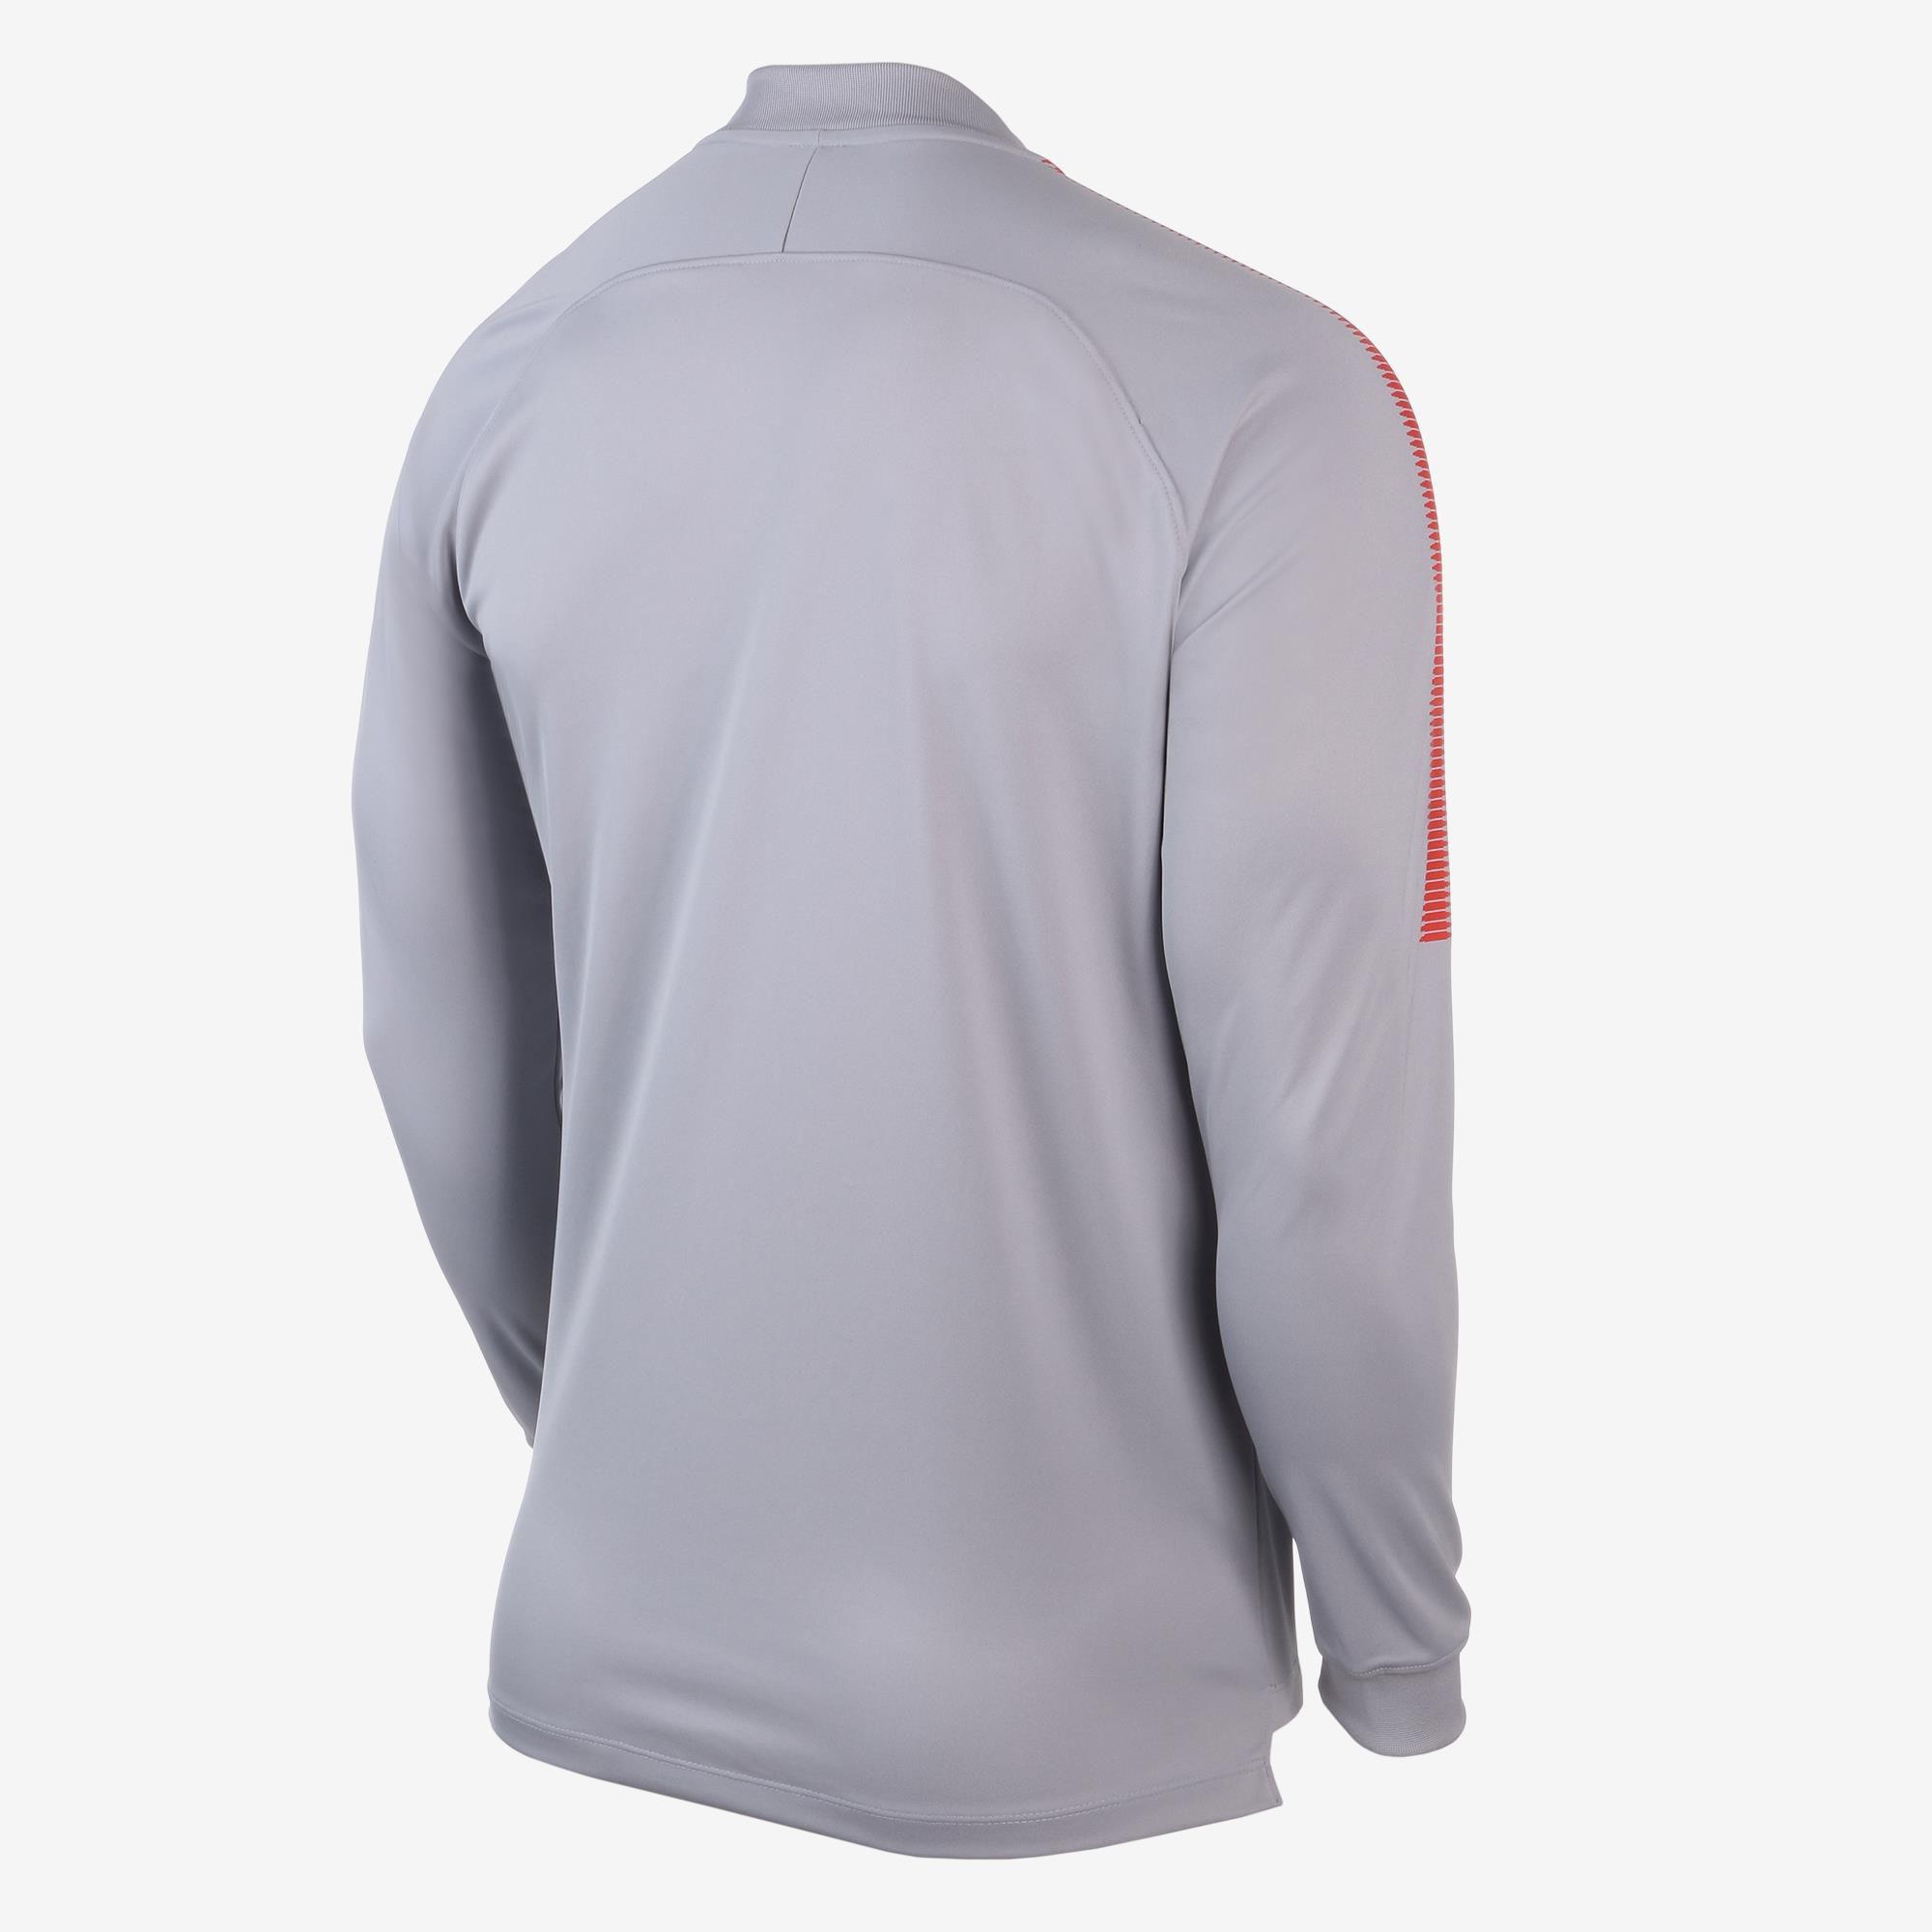 acdff19910 Jaqueta Nike Corinthians Treino 2018 19 Masculina